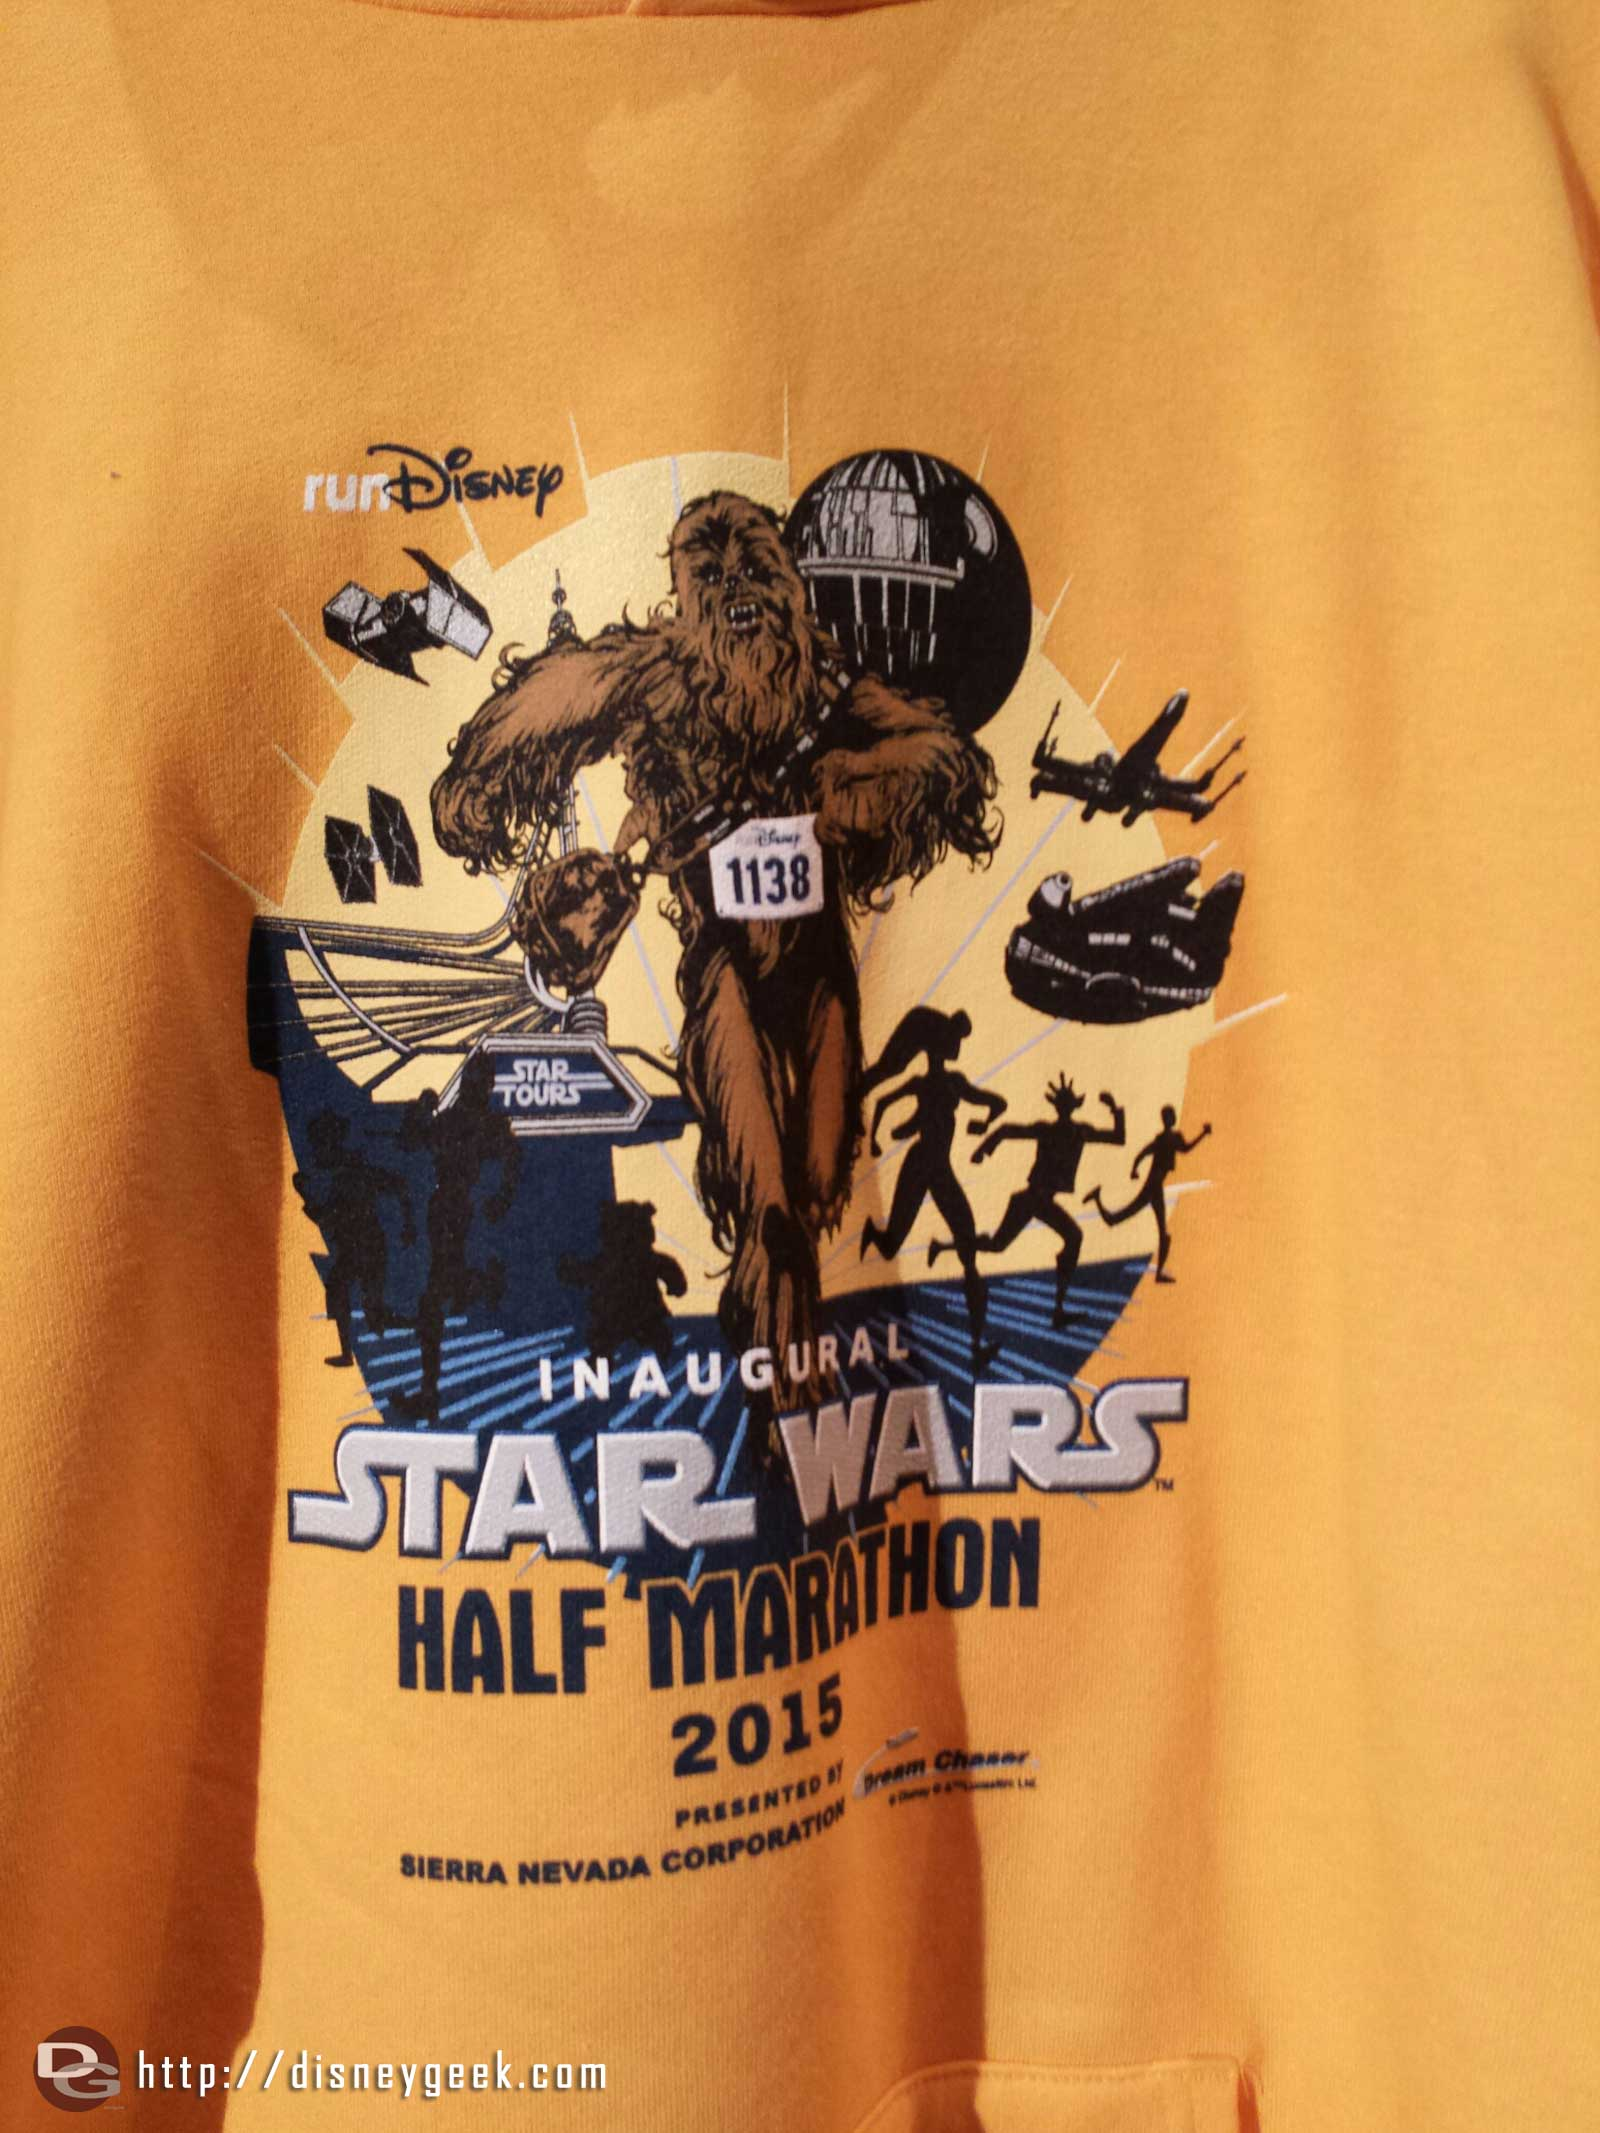 An inaugural Star Wars half marathon shirt #Disneyland